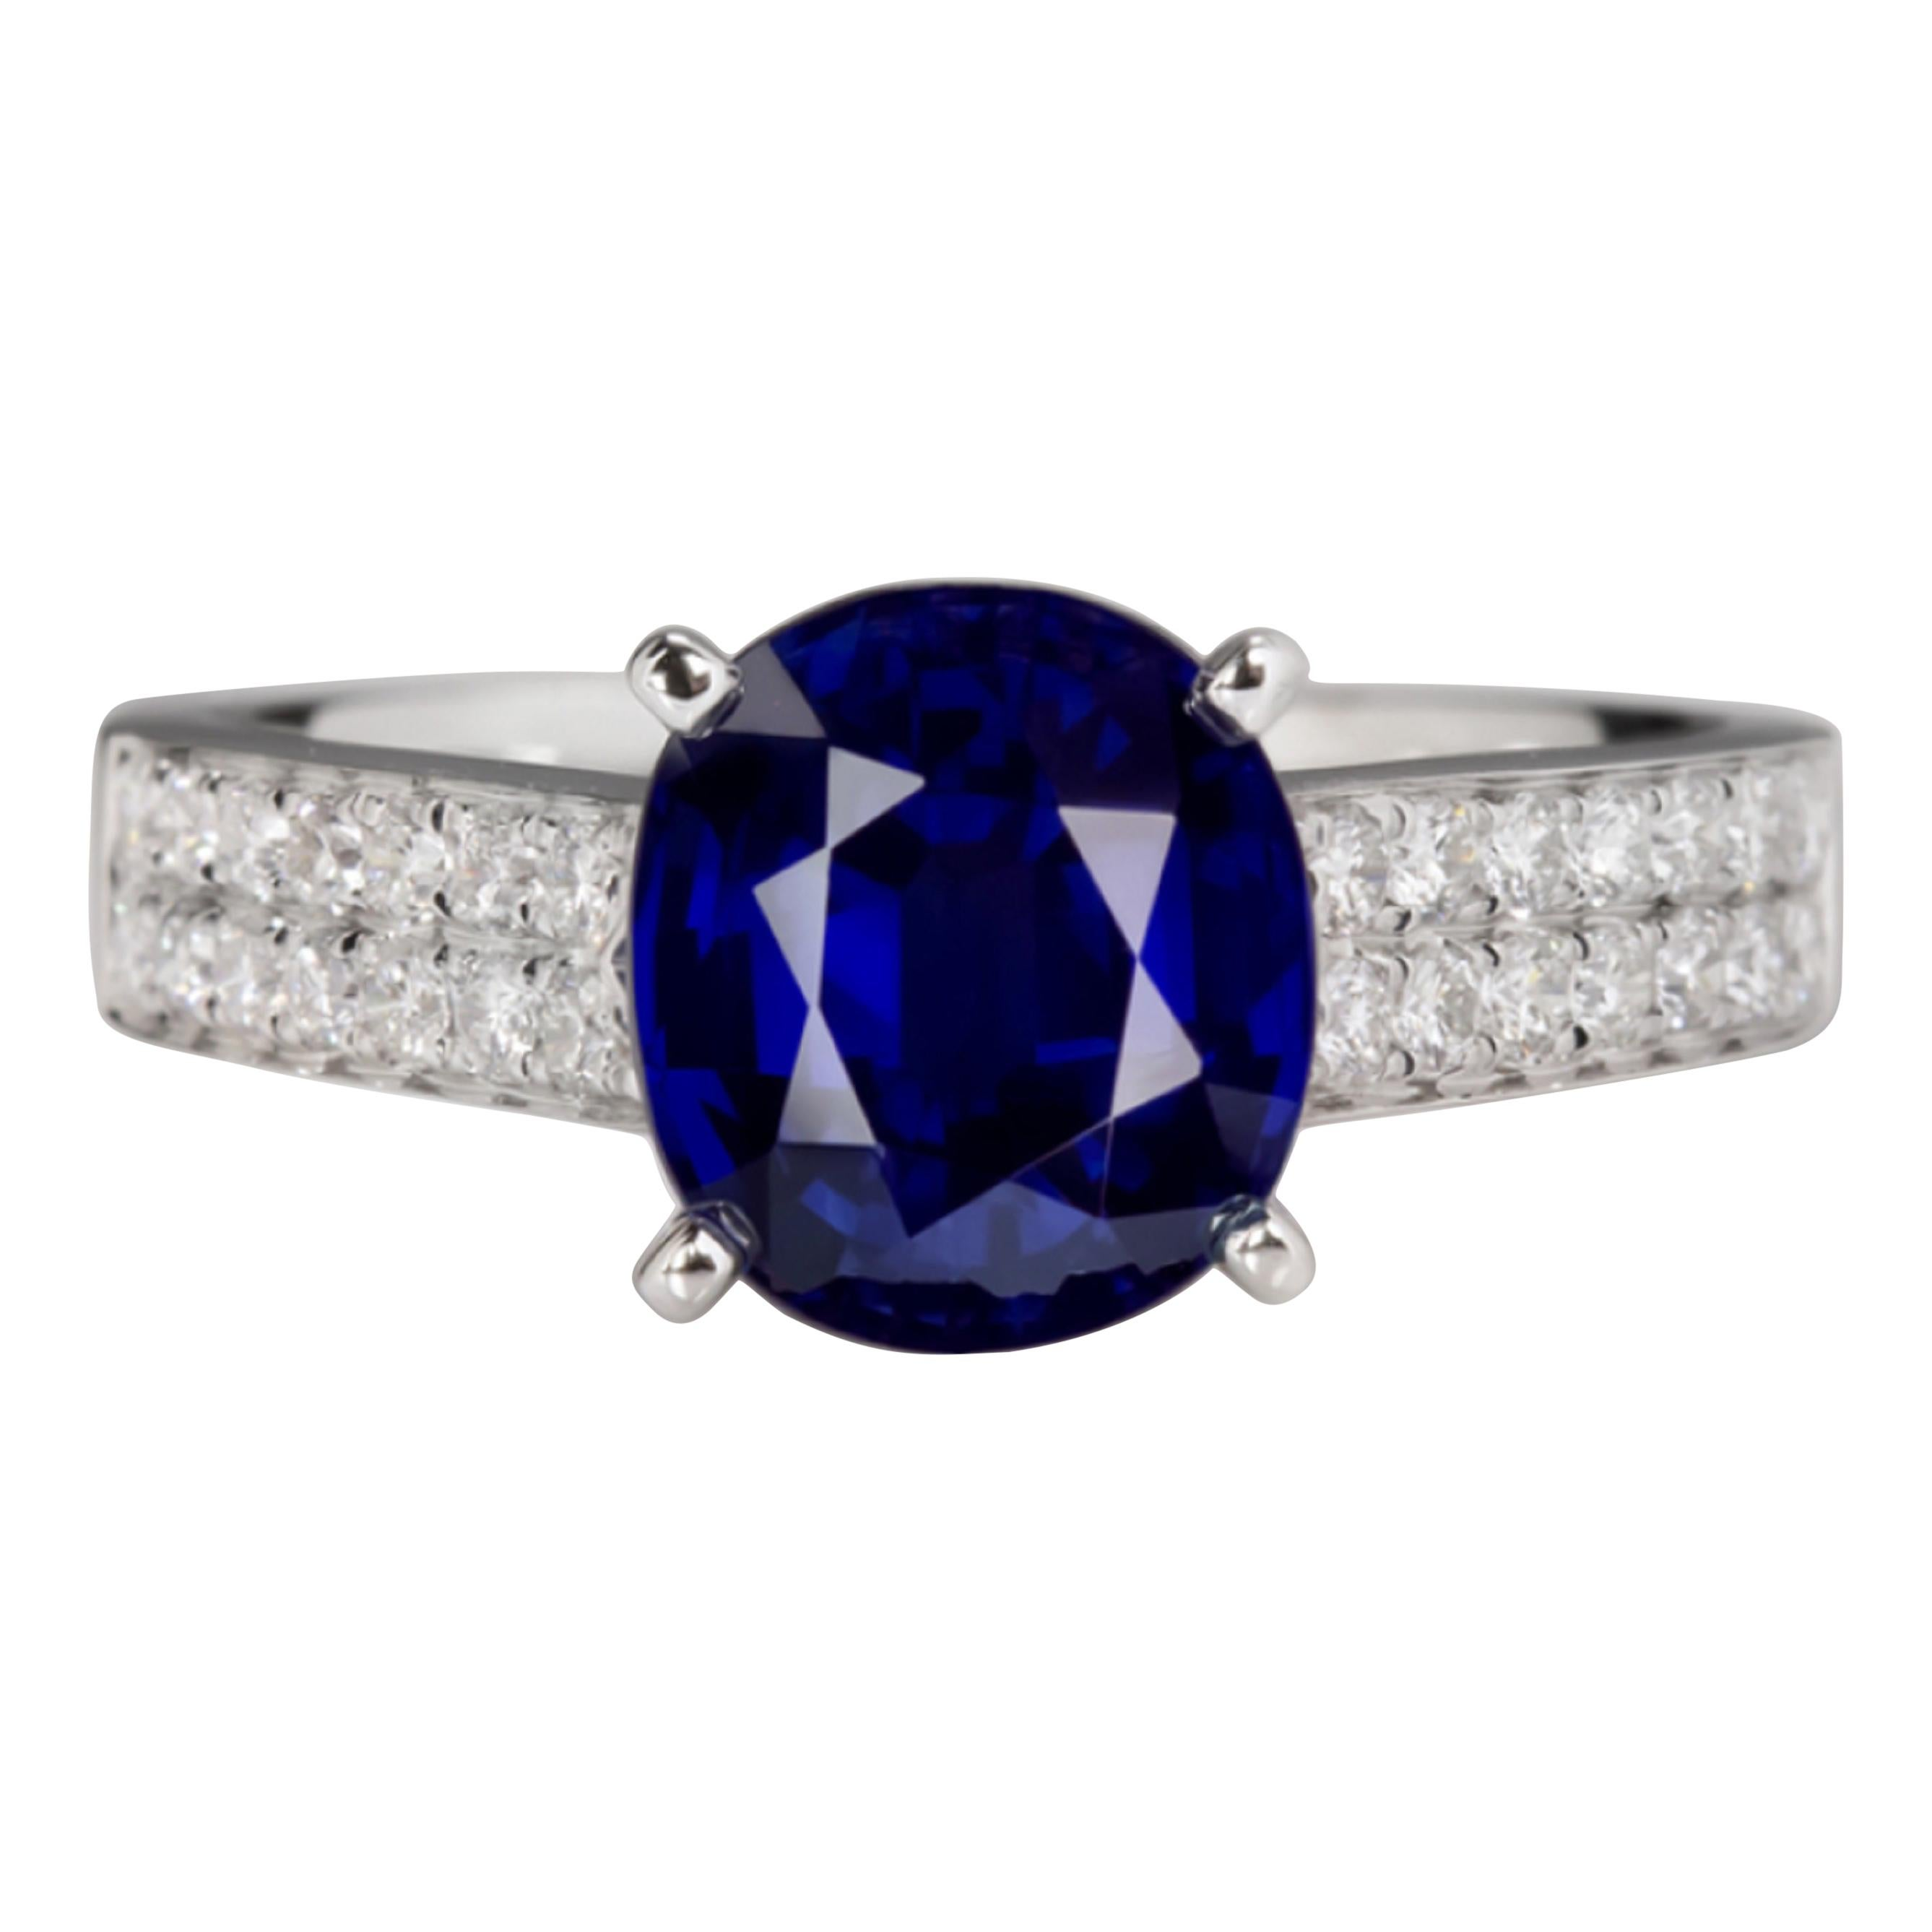 GIA Certified 3.50 Carat Blue Sapphire Diamond White Gold Ring